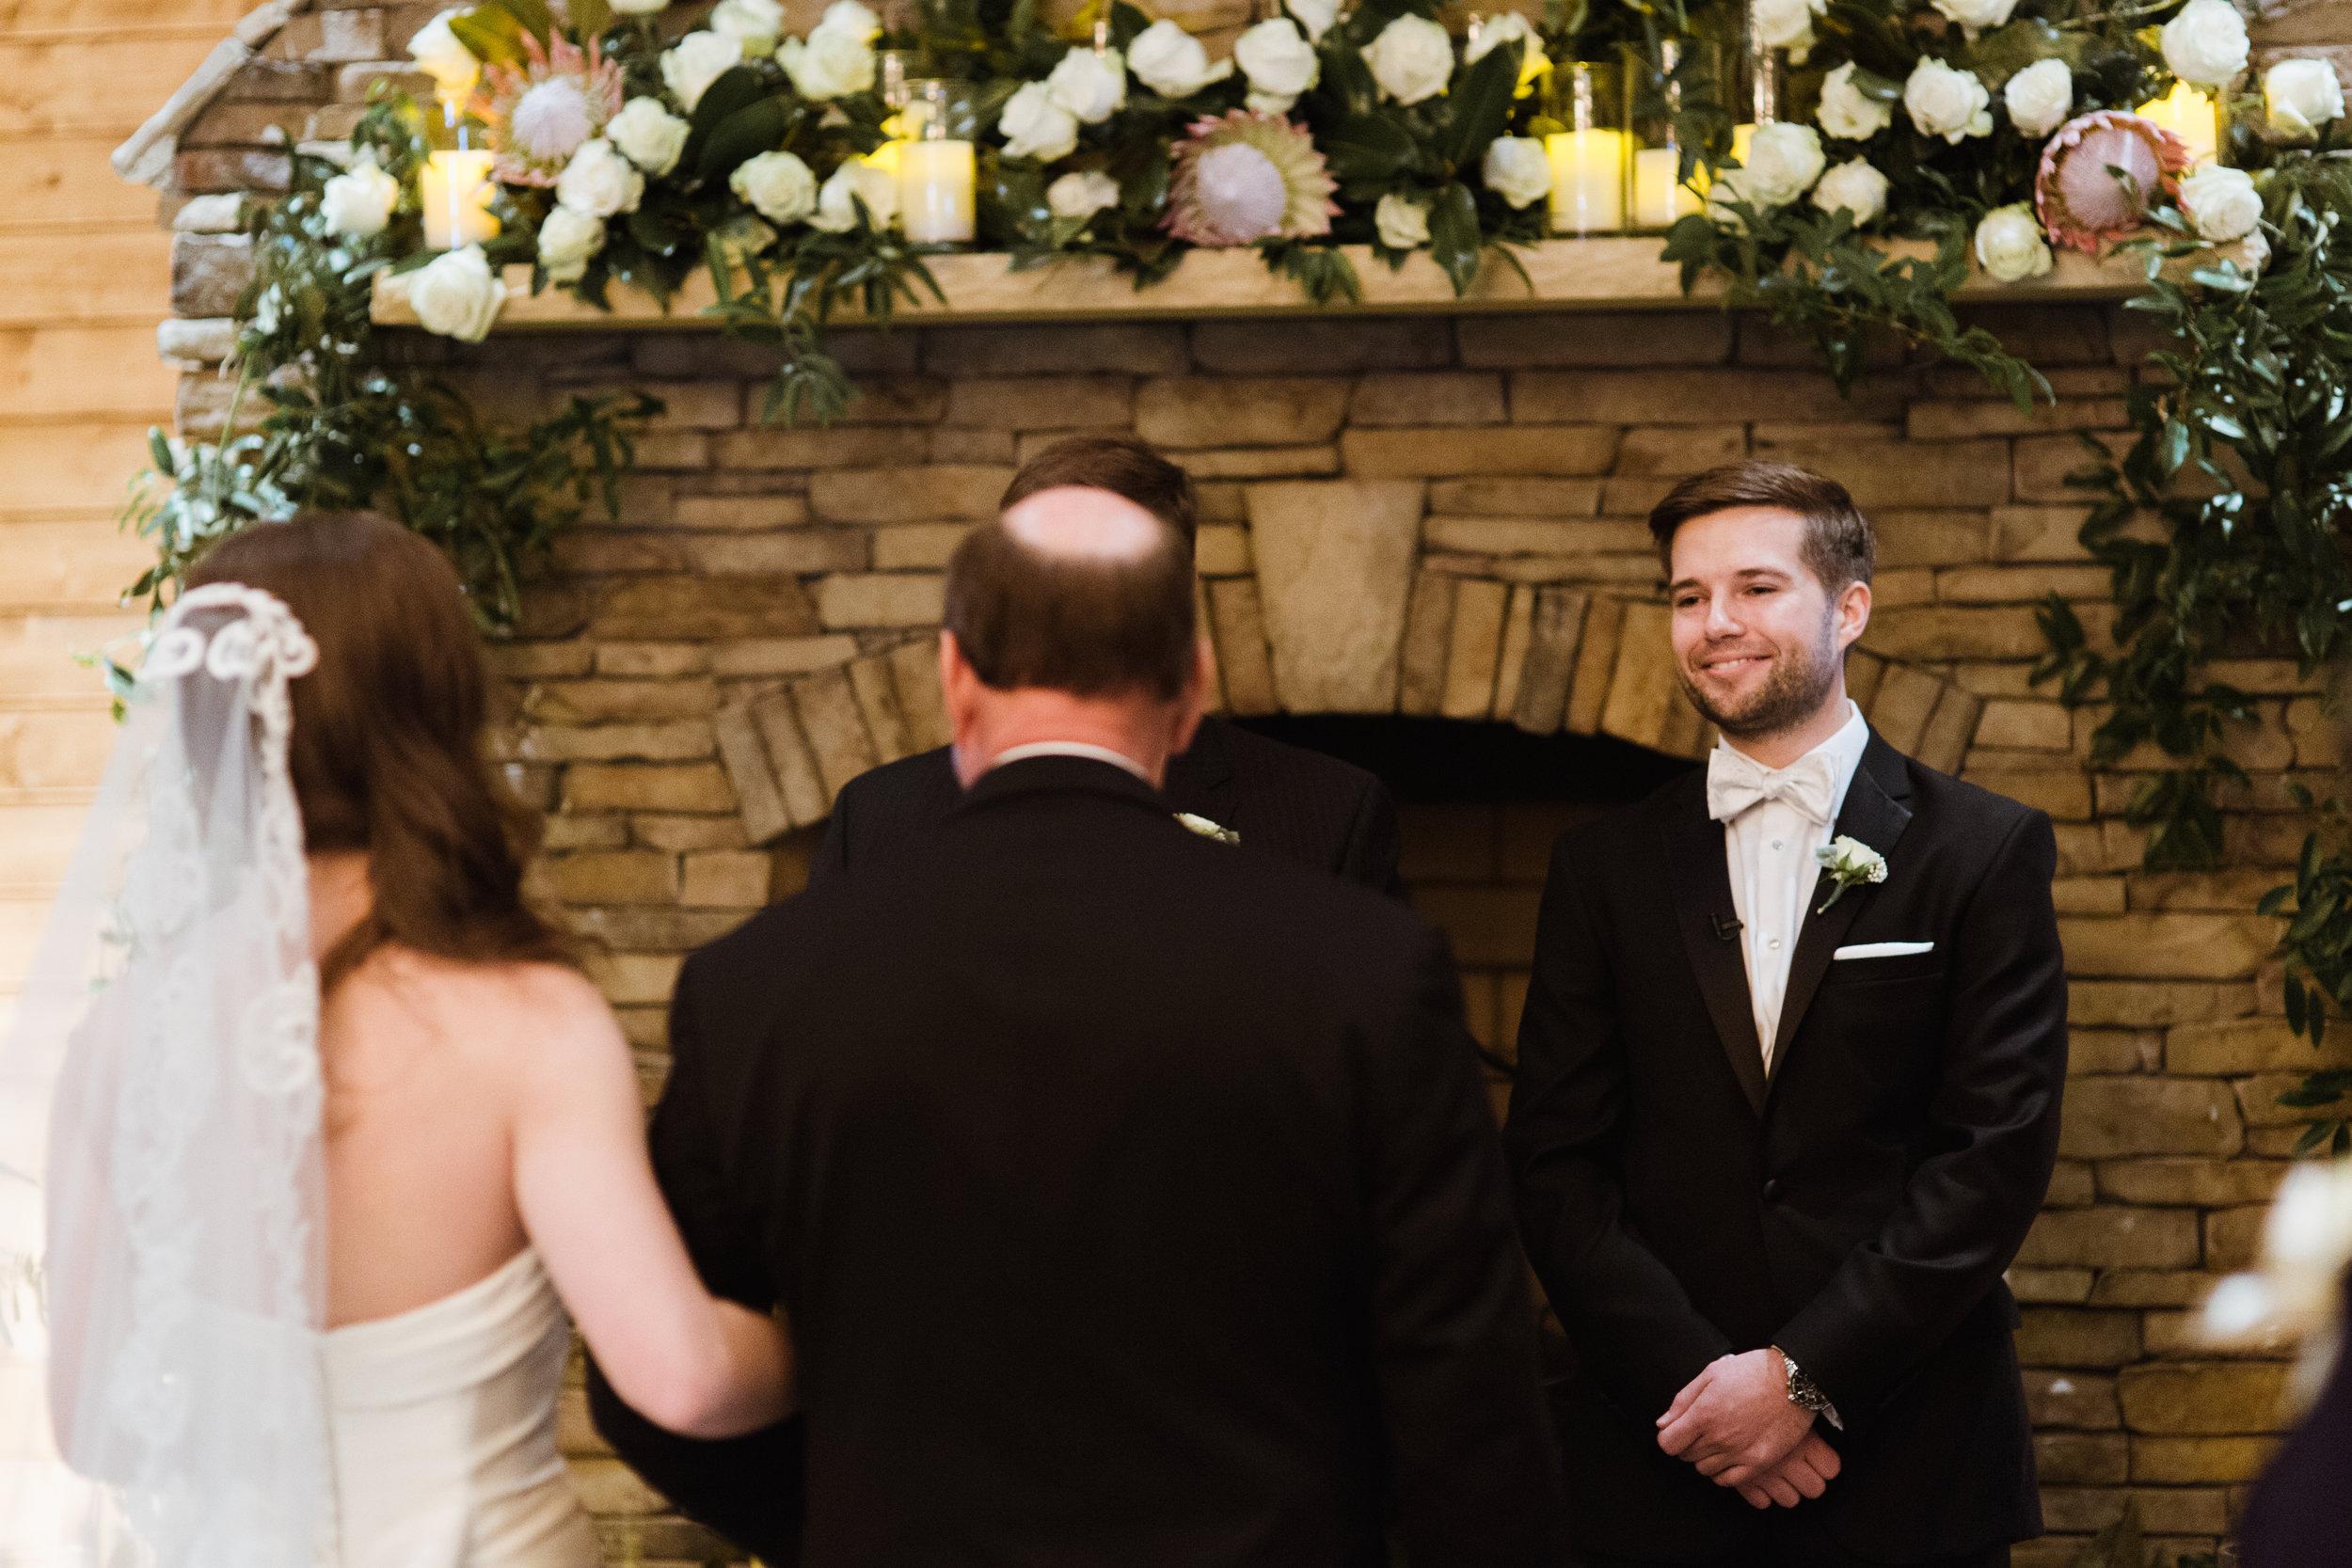 WeddingtonWedding0601.jpg